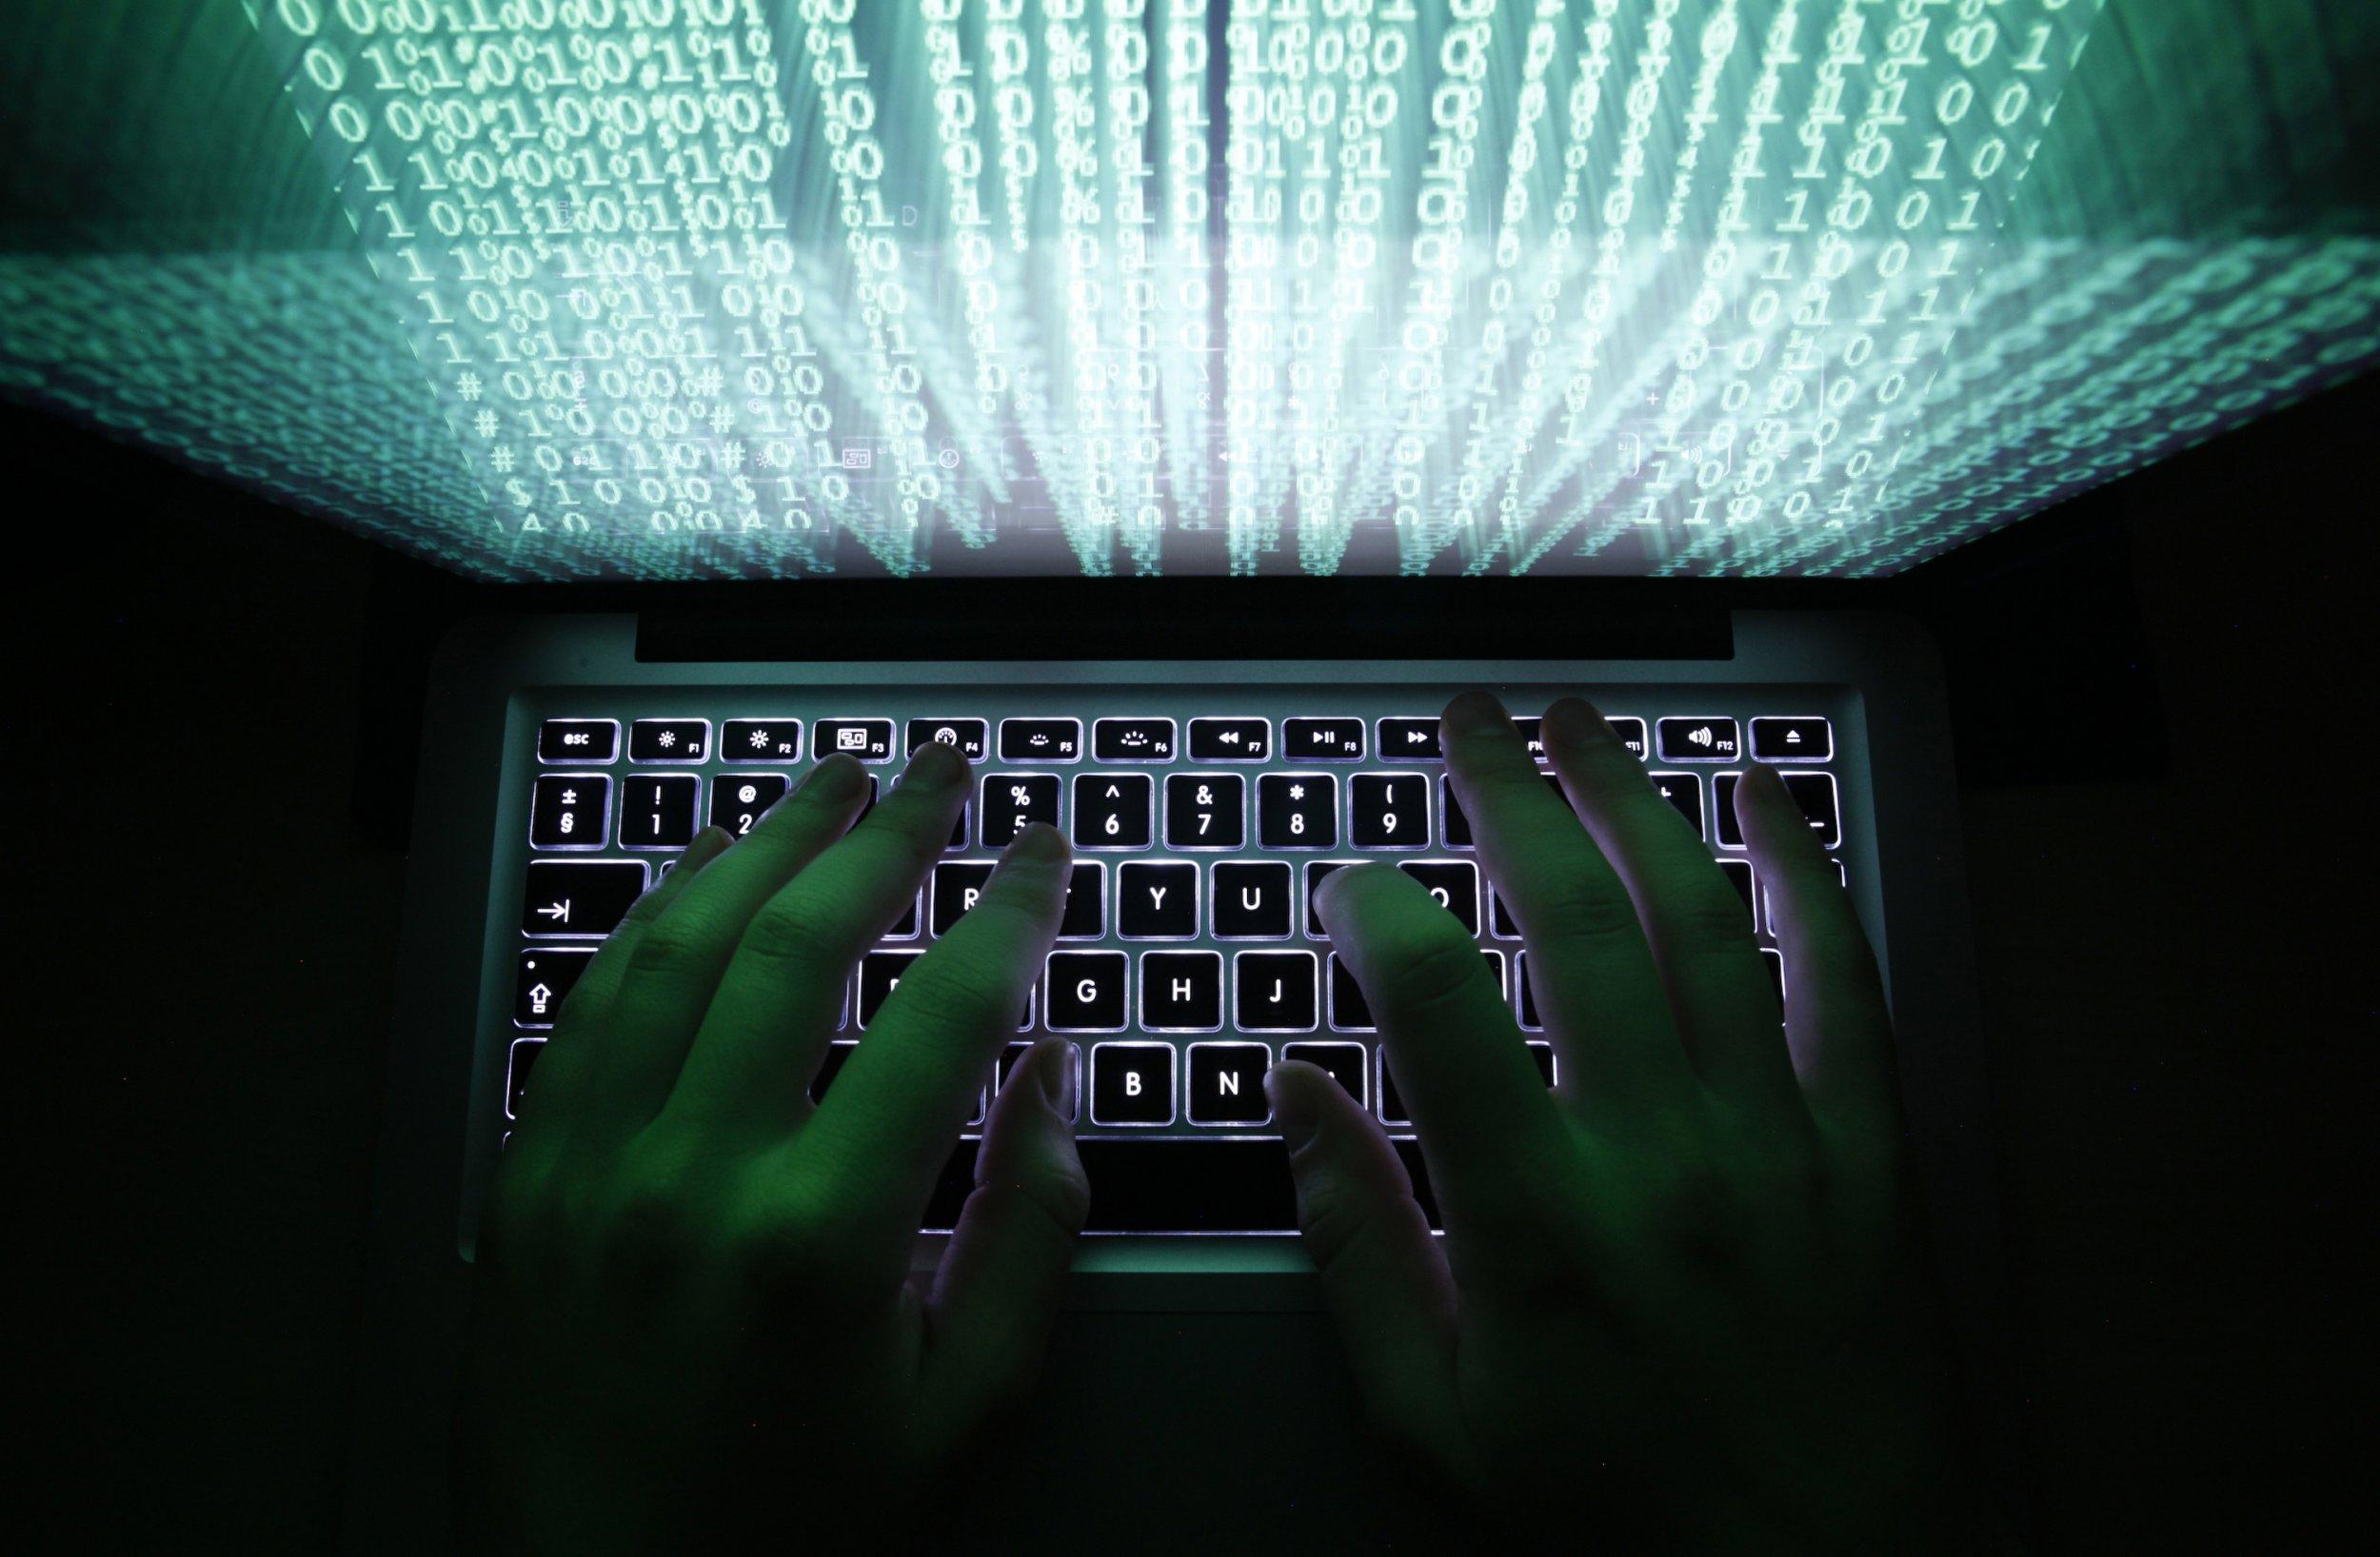 BDS cyber attacks